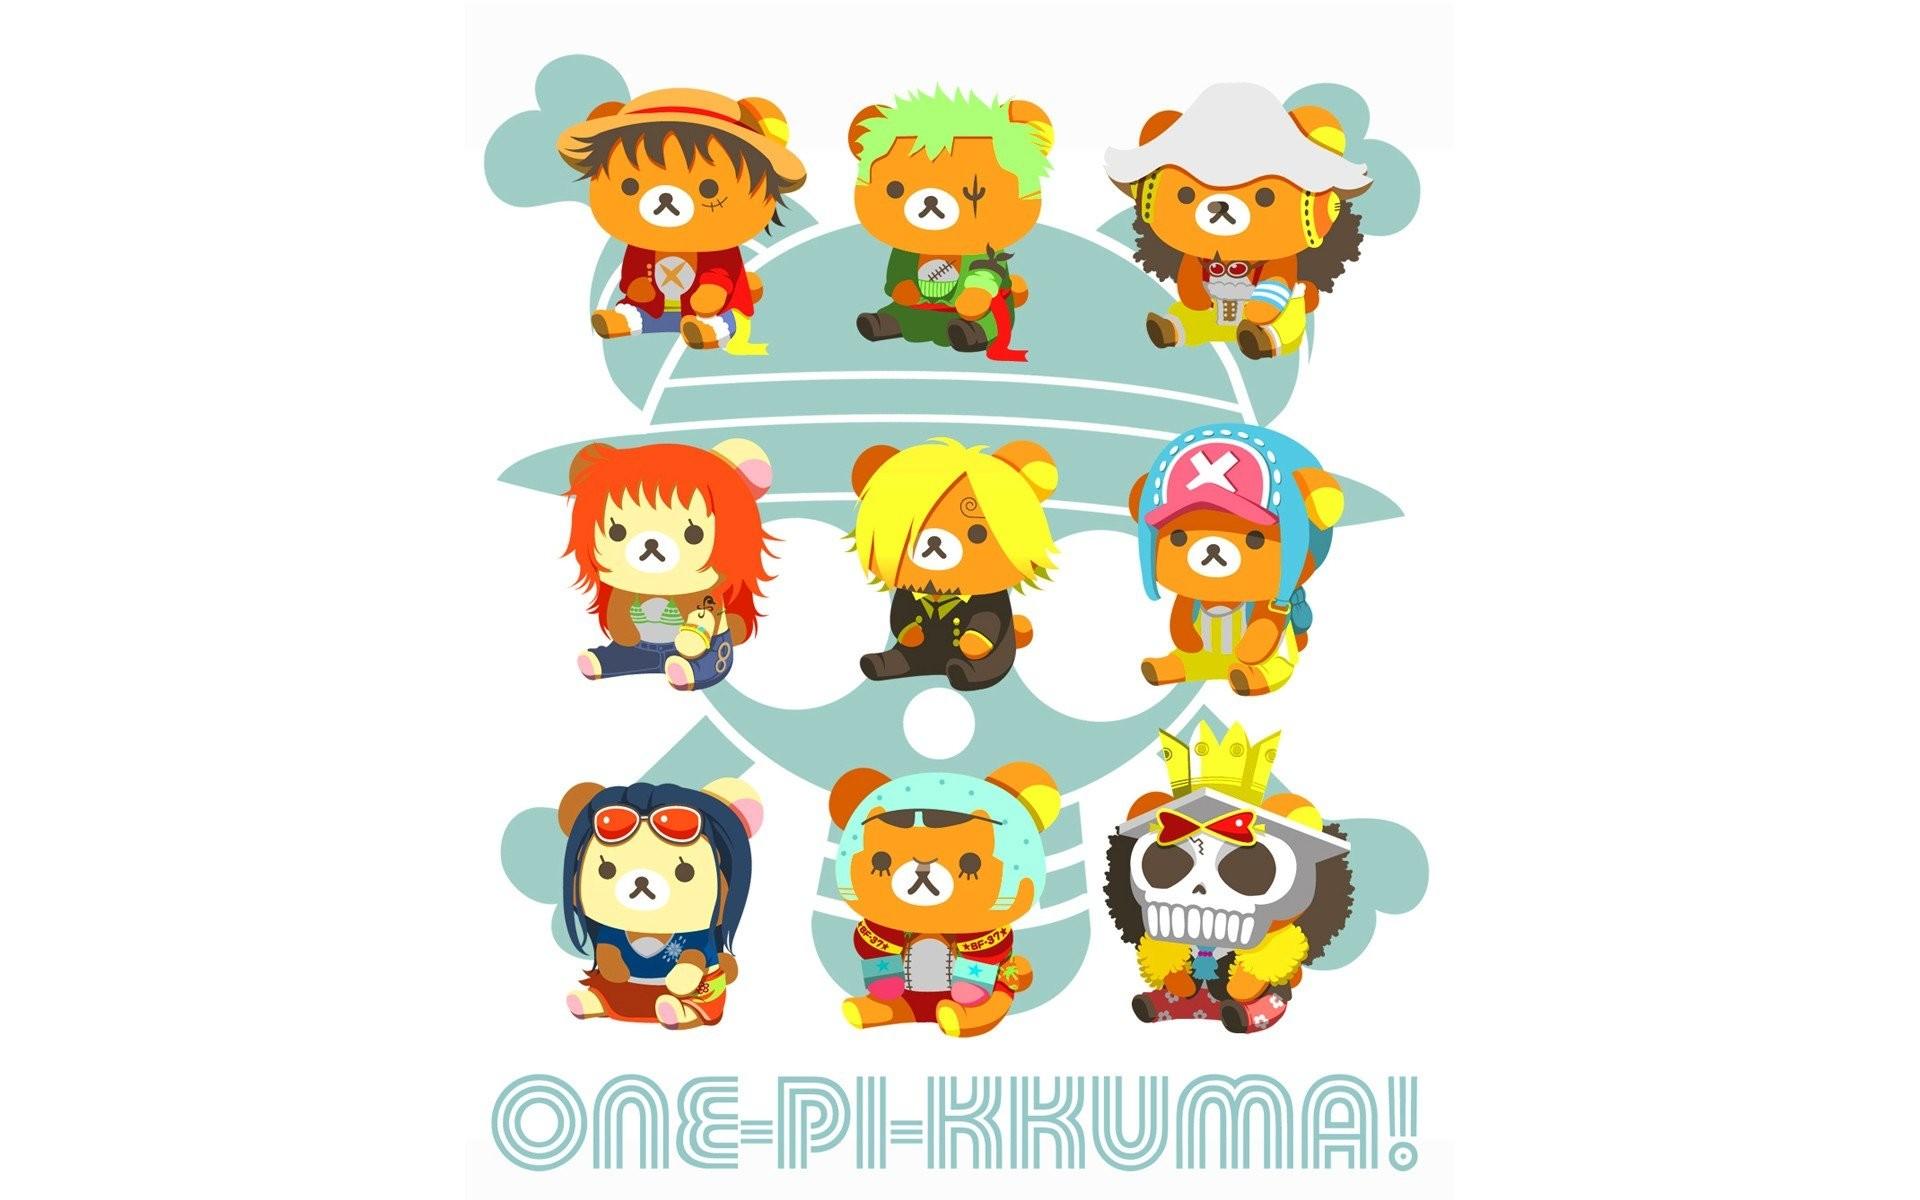 One Piece (anime) Rilakkuma wallpaper     264622   WallpaperUP